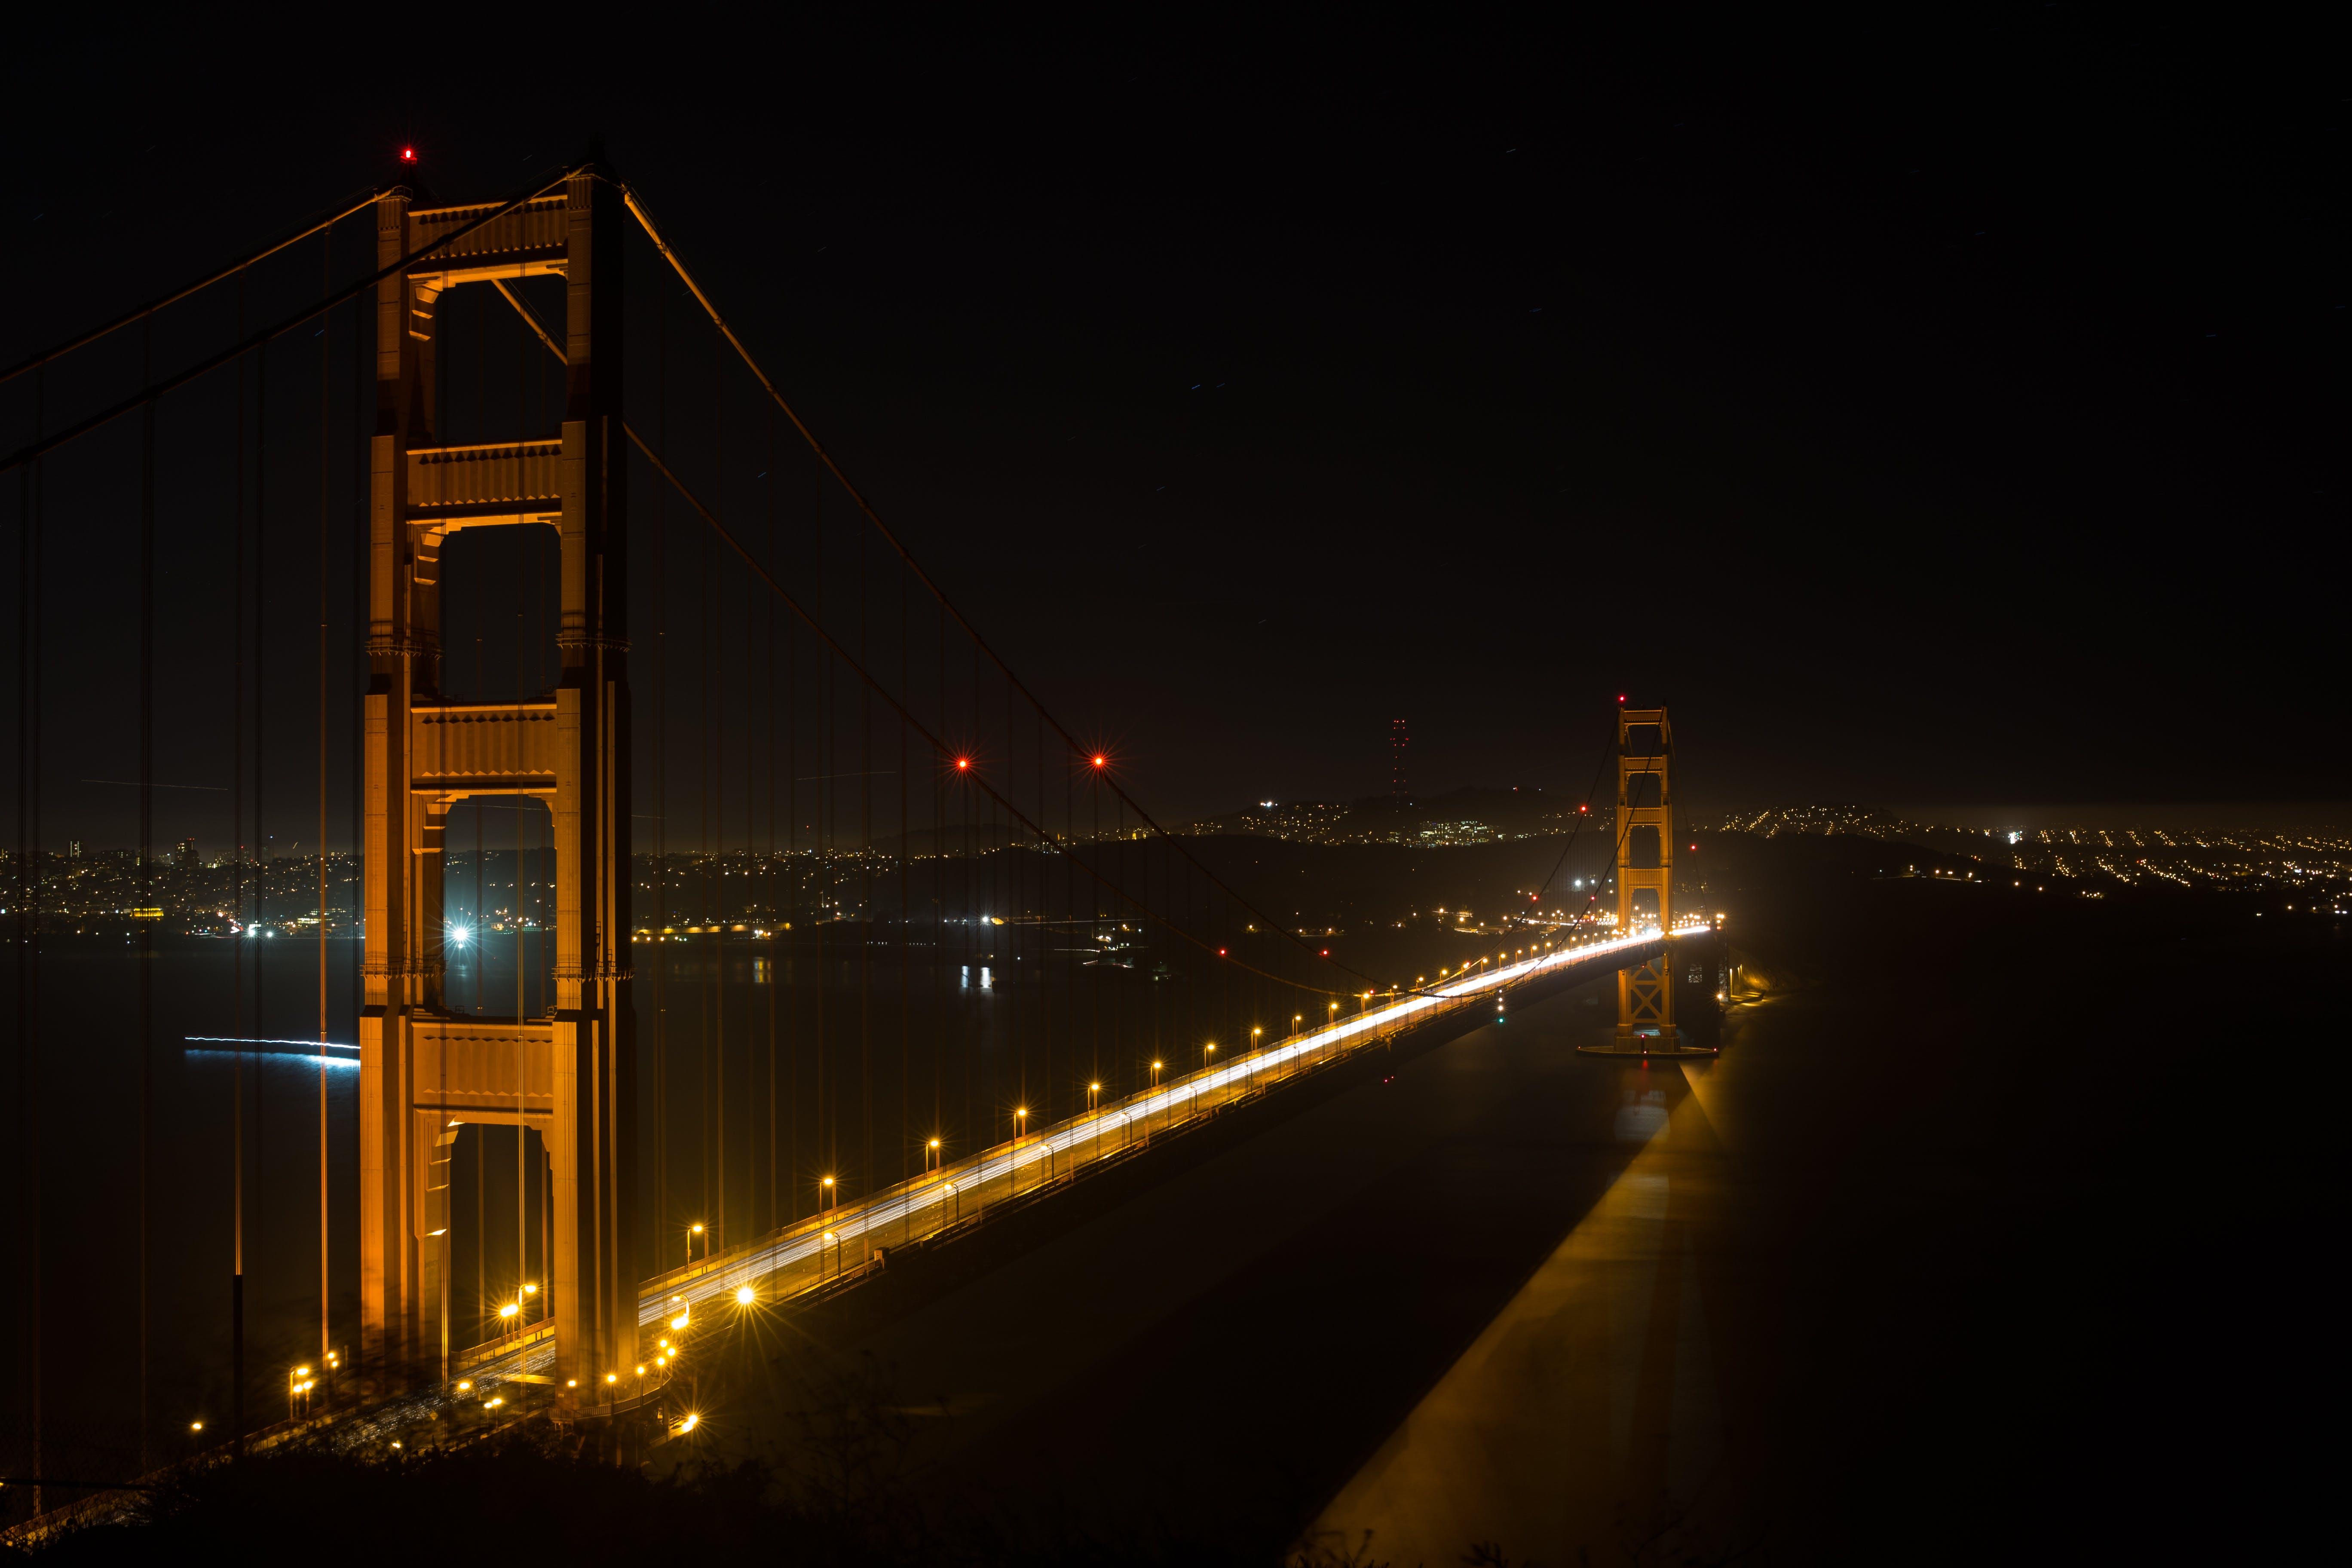 Lighted Brown Bridge